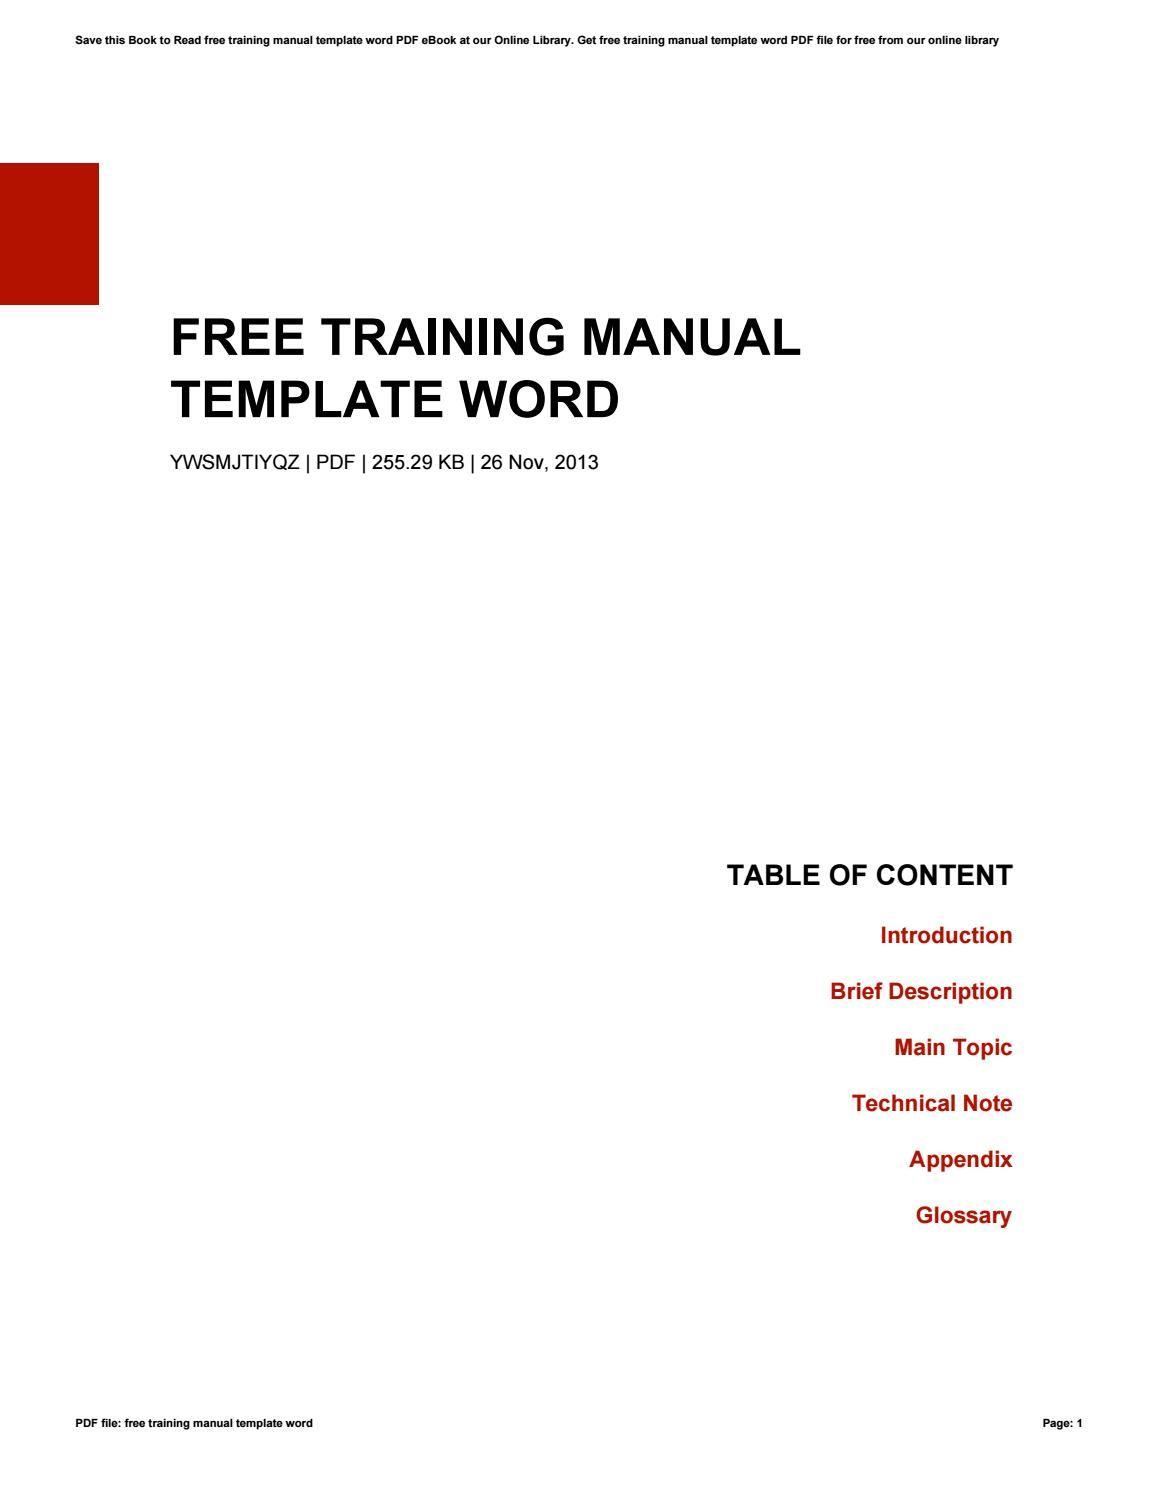 Free Training Manual Template Wordkazelink257 Issuu Throughout Training Documentation Template Word Be Word Template Letter Template Word Workbook Template